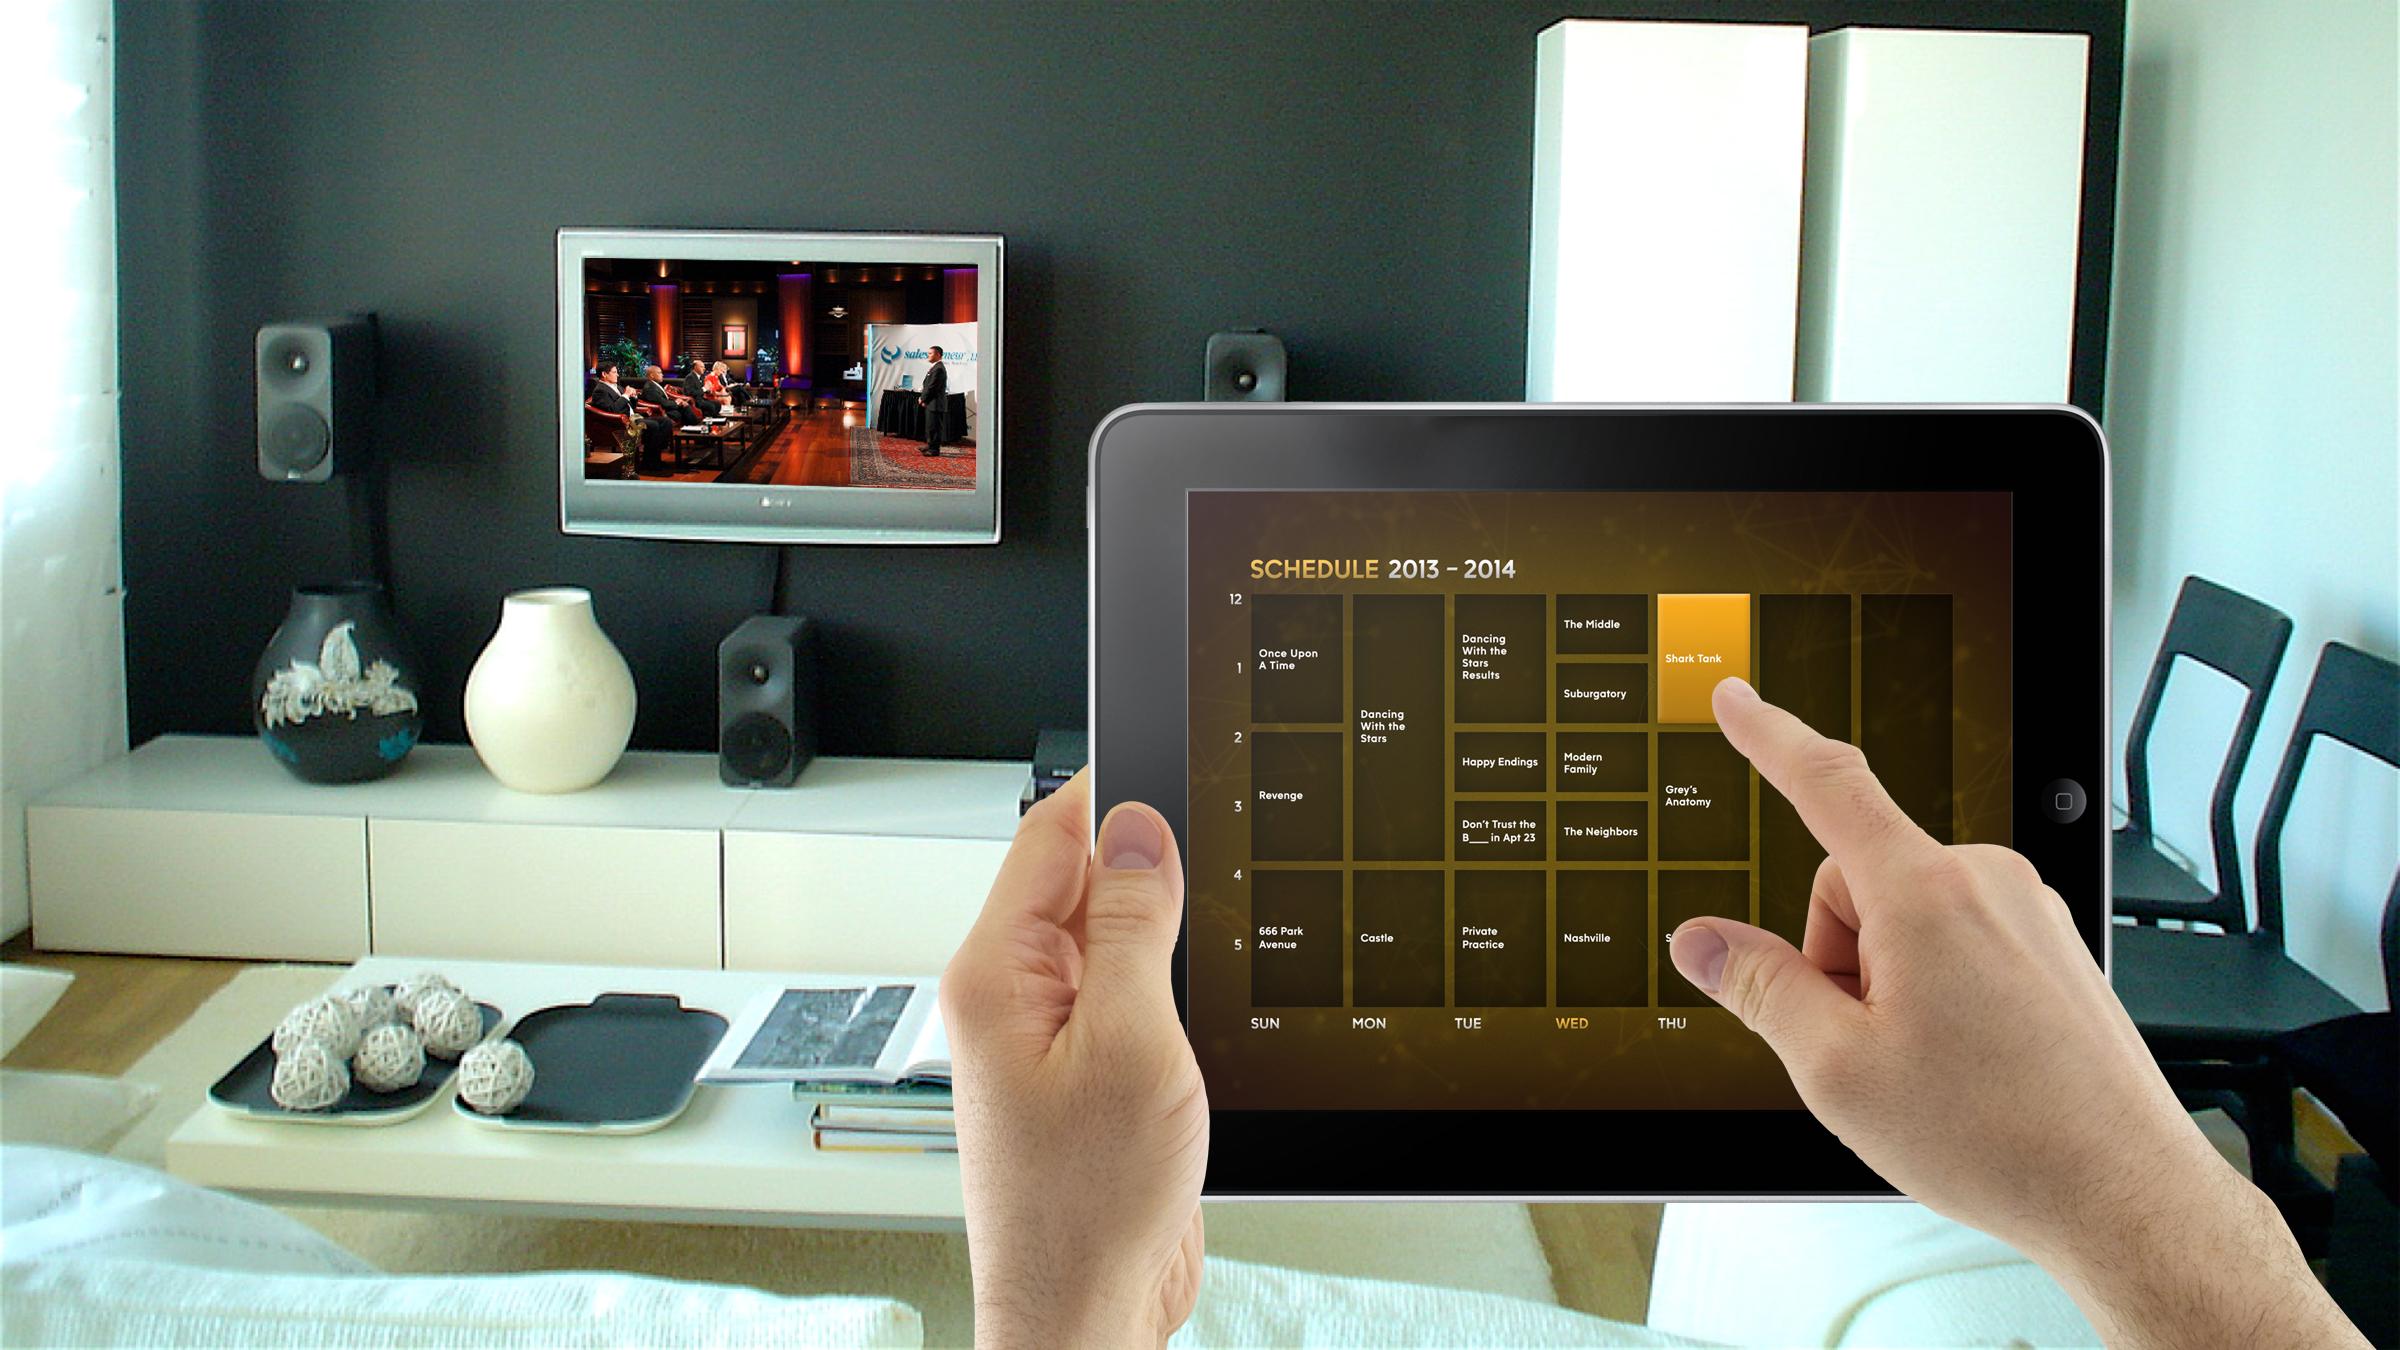 iPad_In-Situ_View_0001_Layer Comp 2.jpg